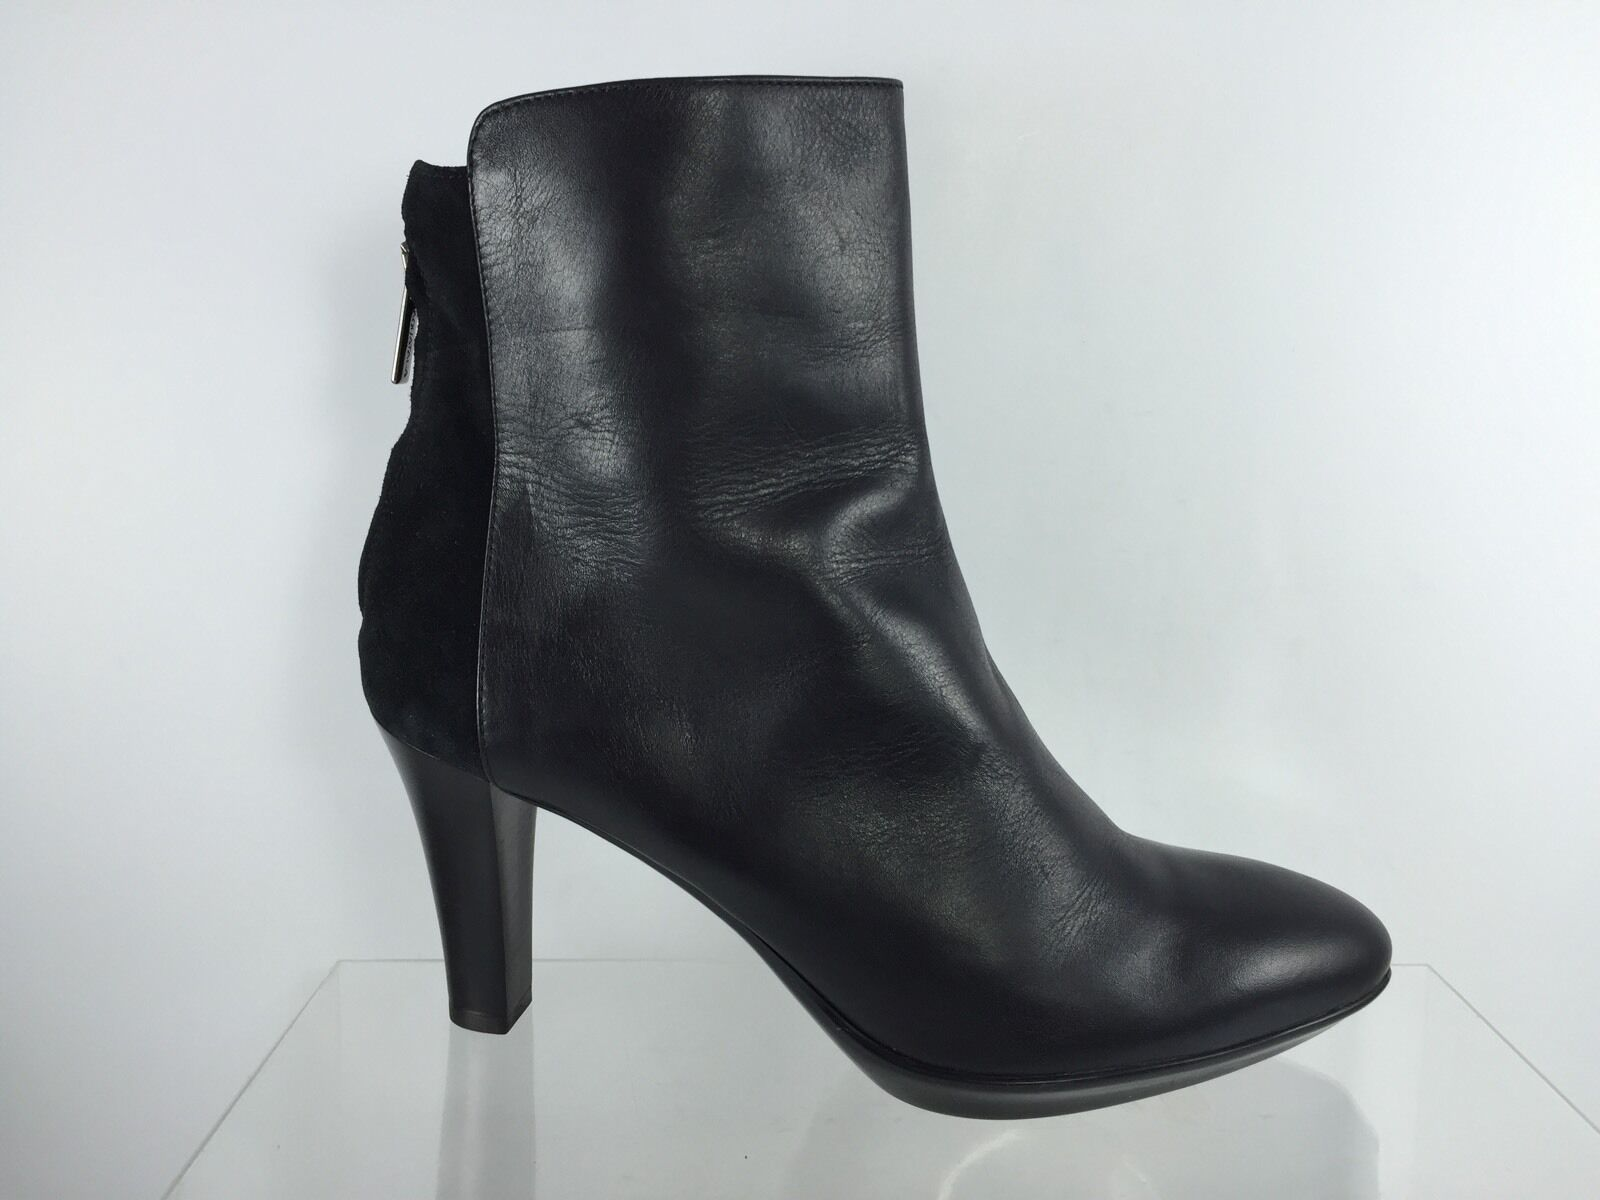 Aquatalia Womens Black Leather Ankle Boots 10